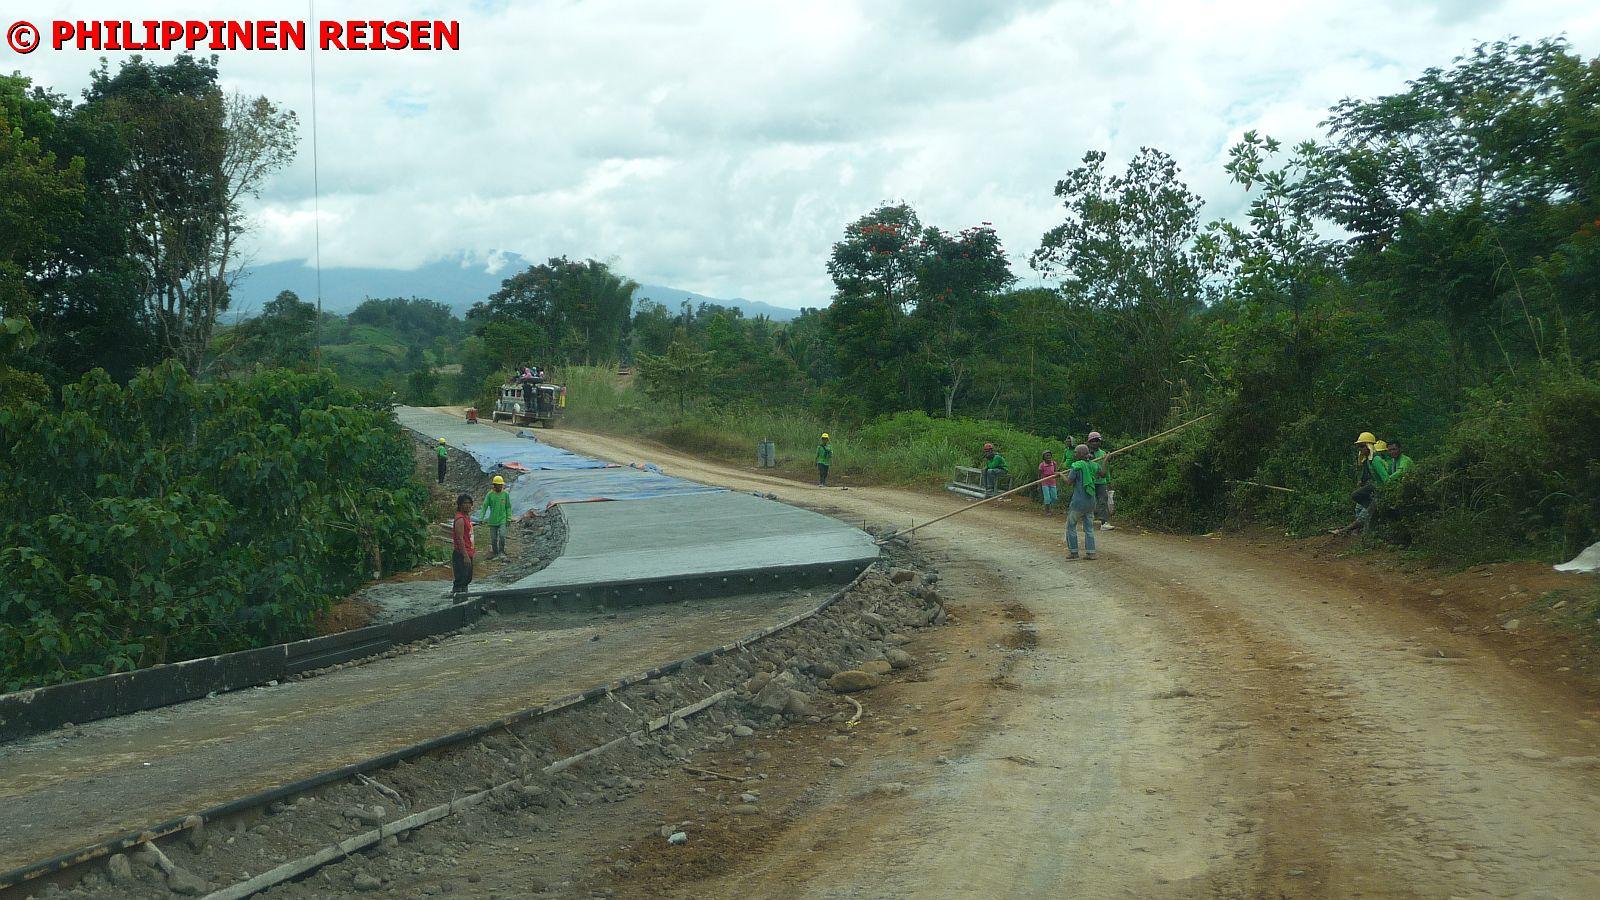 PHILIPPINEN REISEN - REISEBERICHTE - Mindanao - 2-Tagesfahrt rund um Mount Kitanglad Foto: Sir Dieter Sokoll KR